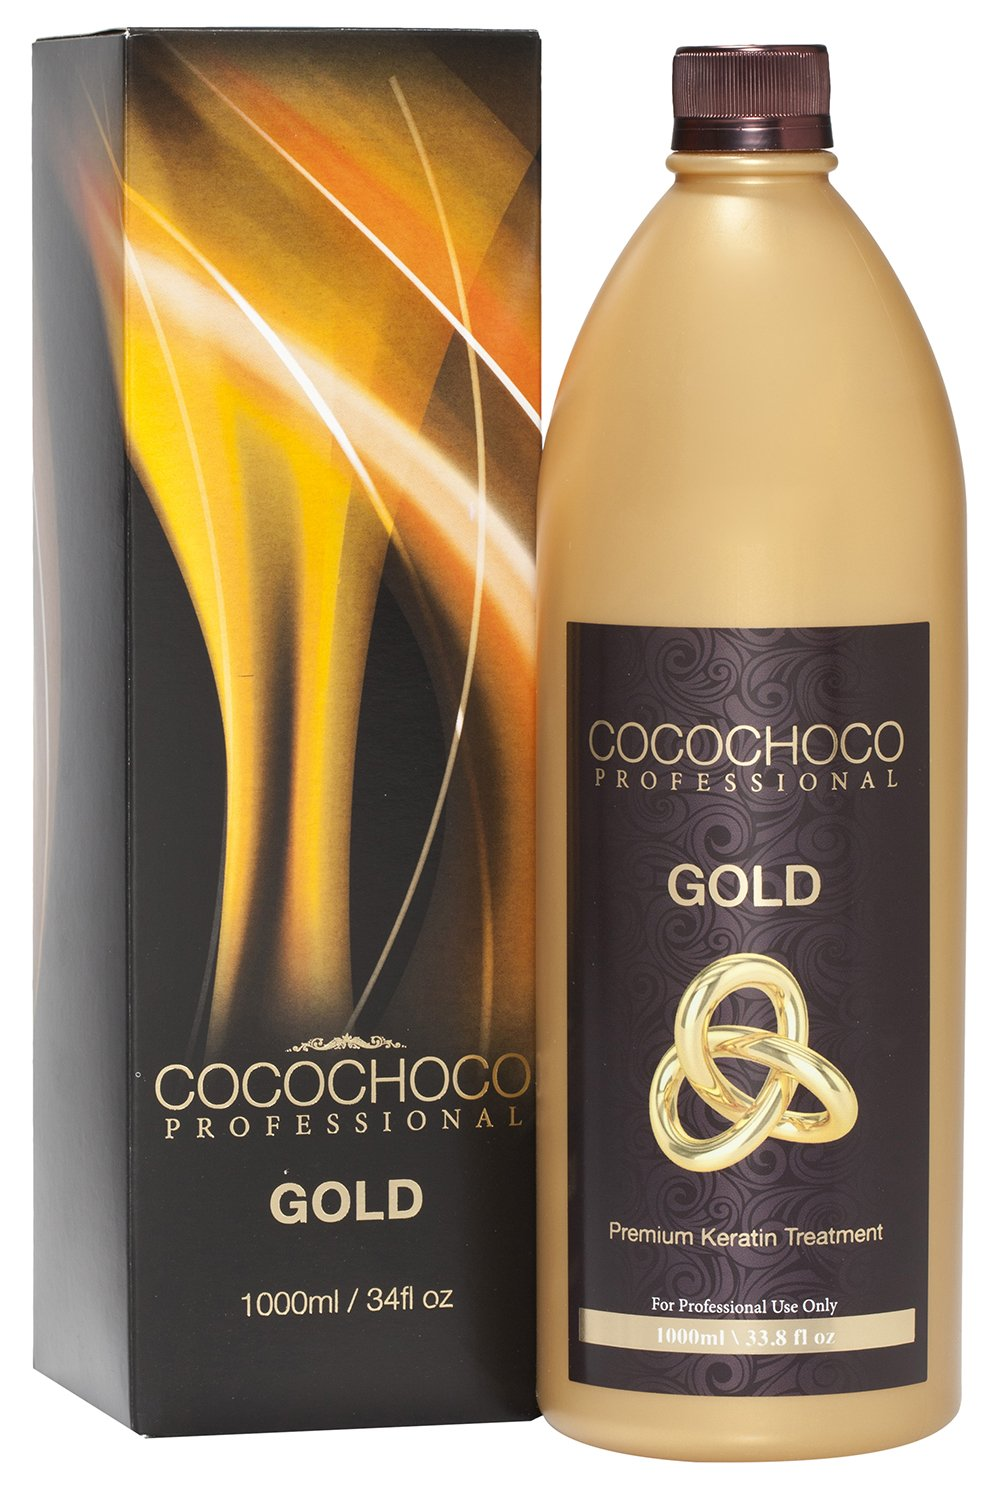 Cocochoco Professional Gold Premium Keratin Hair Treatment, 1000 ml